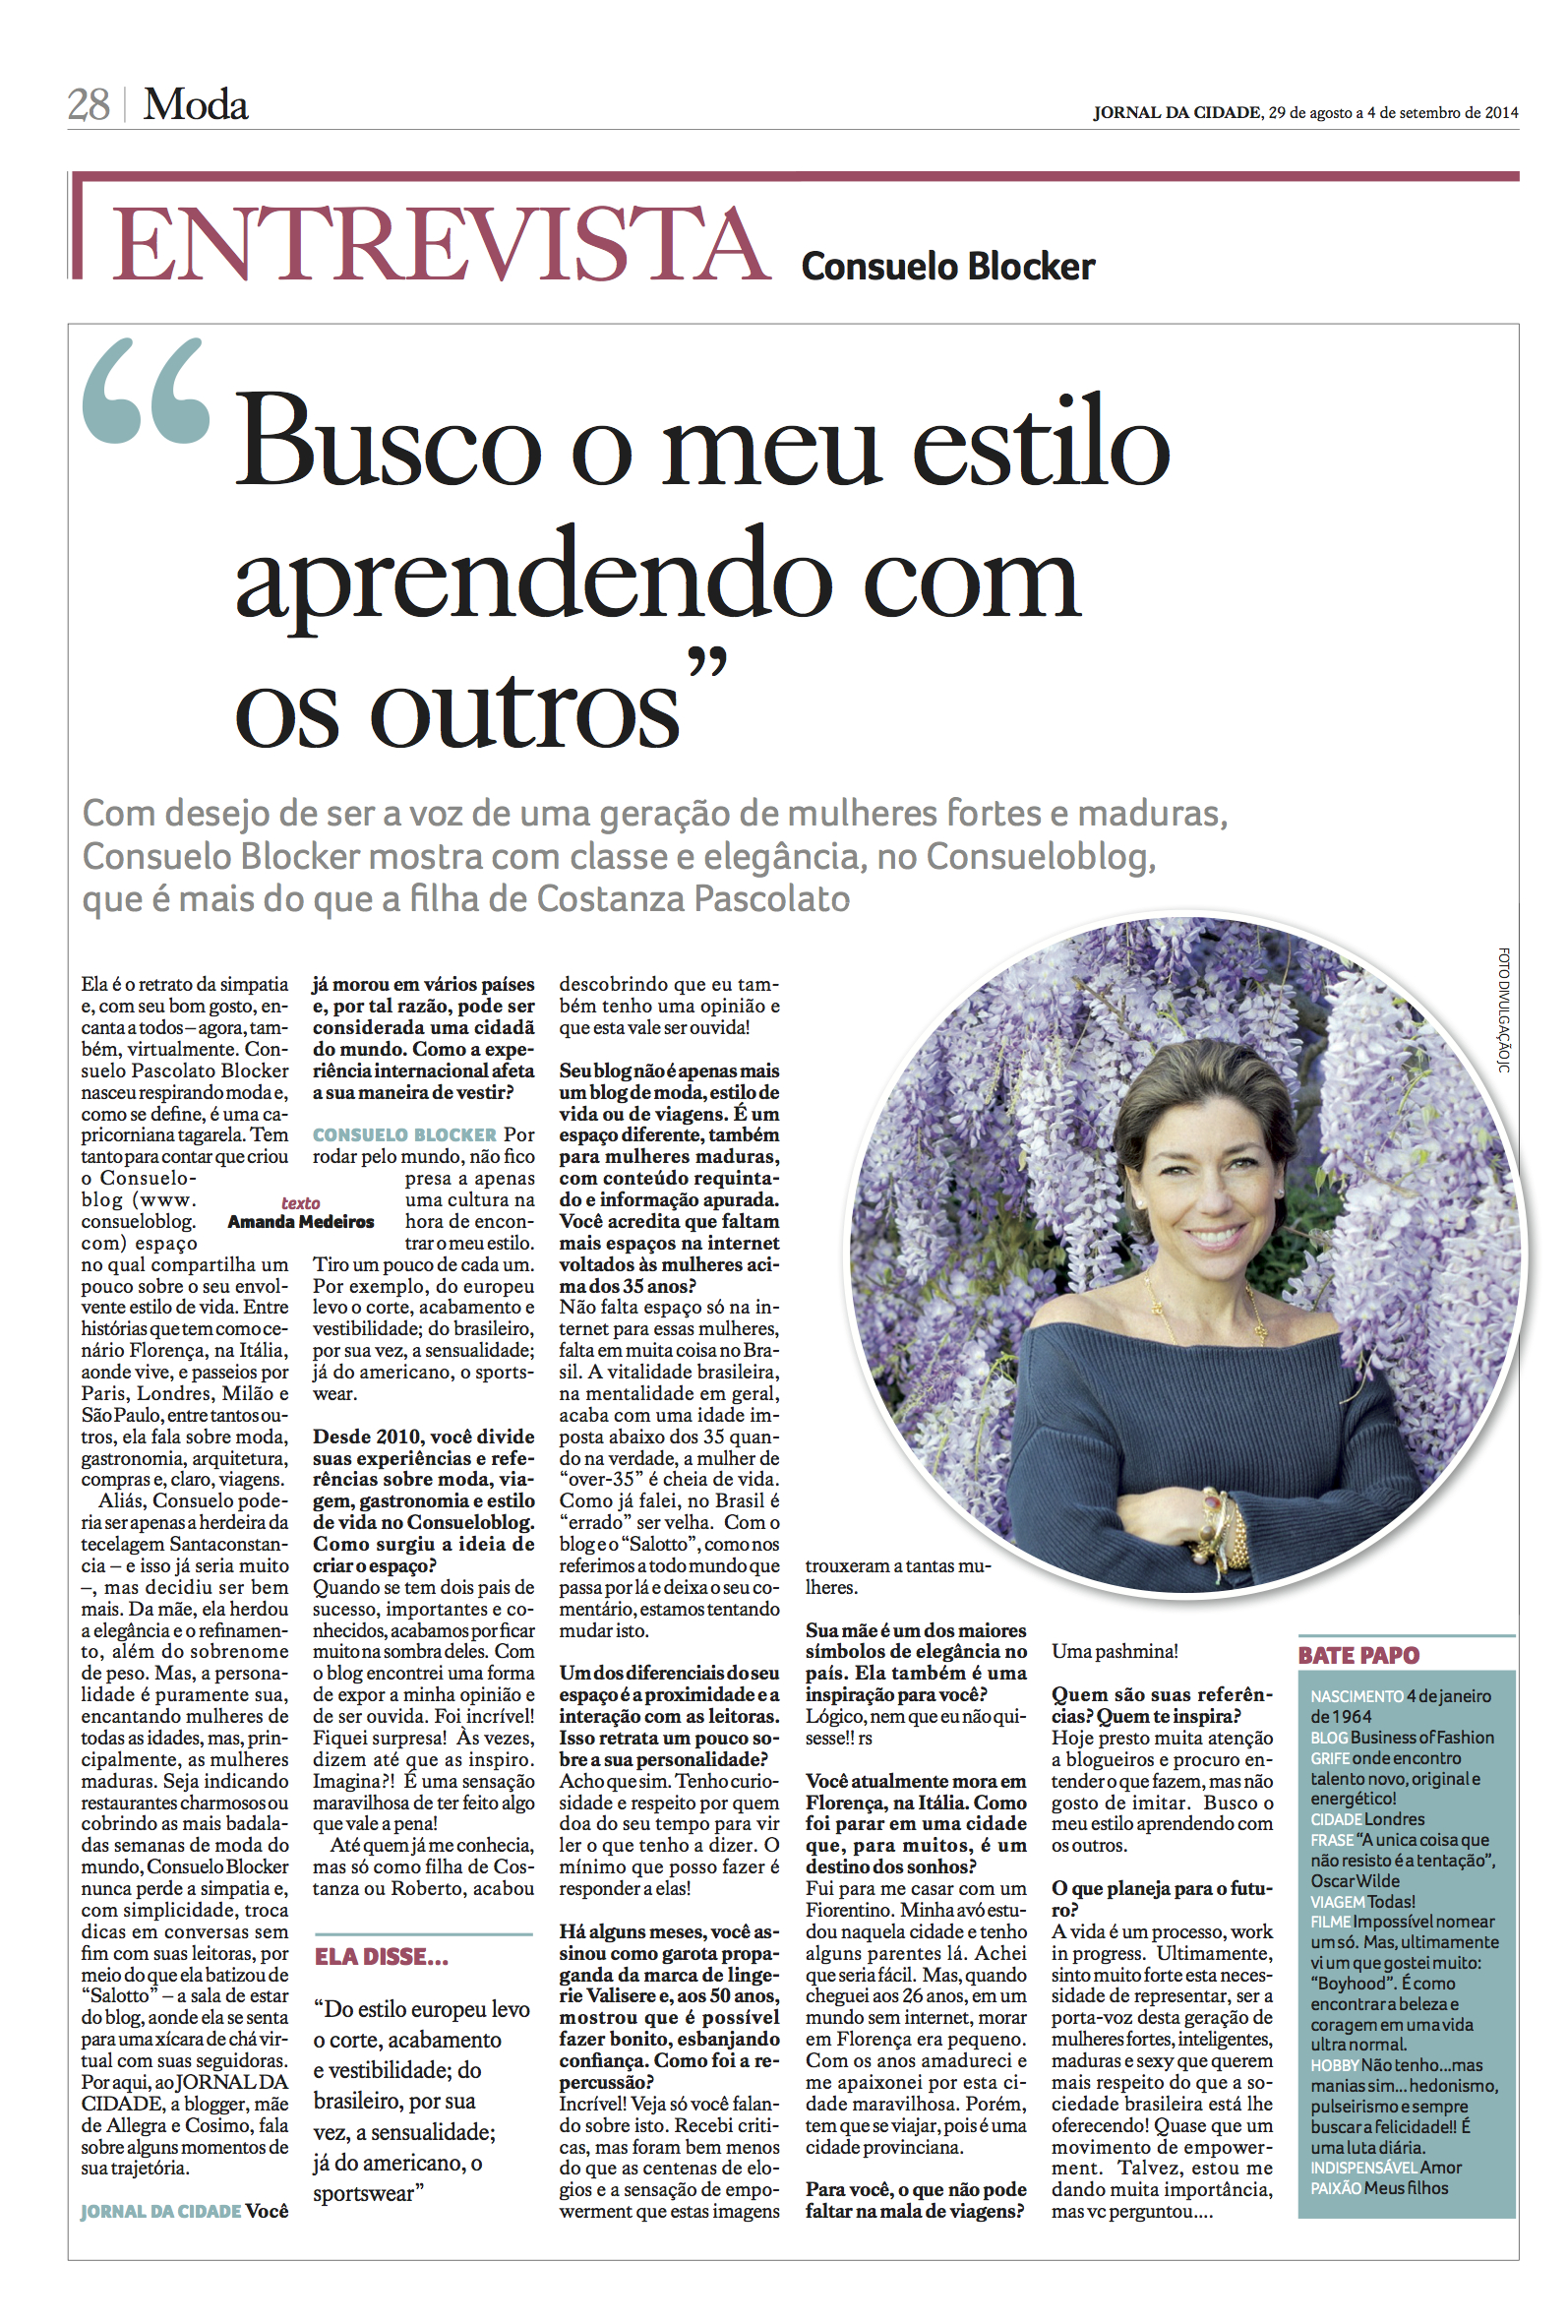 Entrevista ao Jornal da Cidade de Belo Horizonte